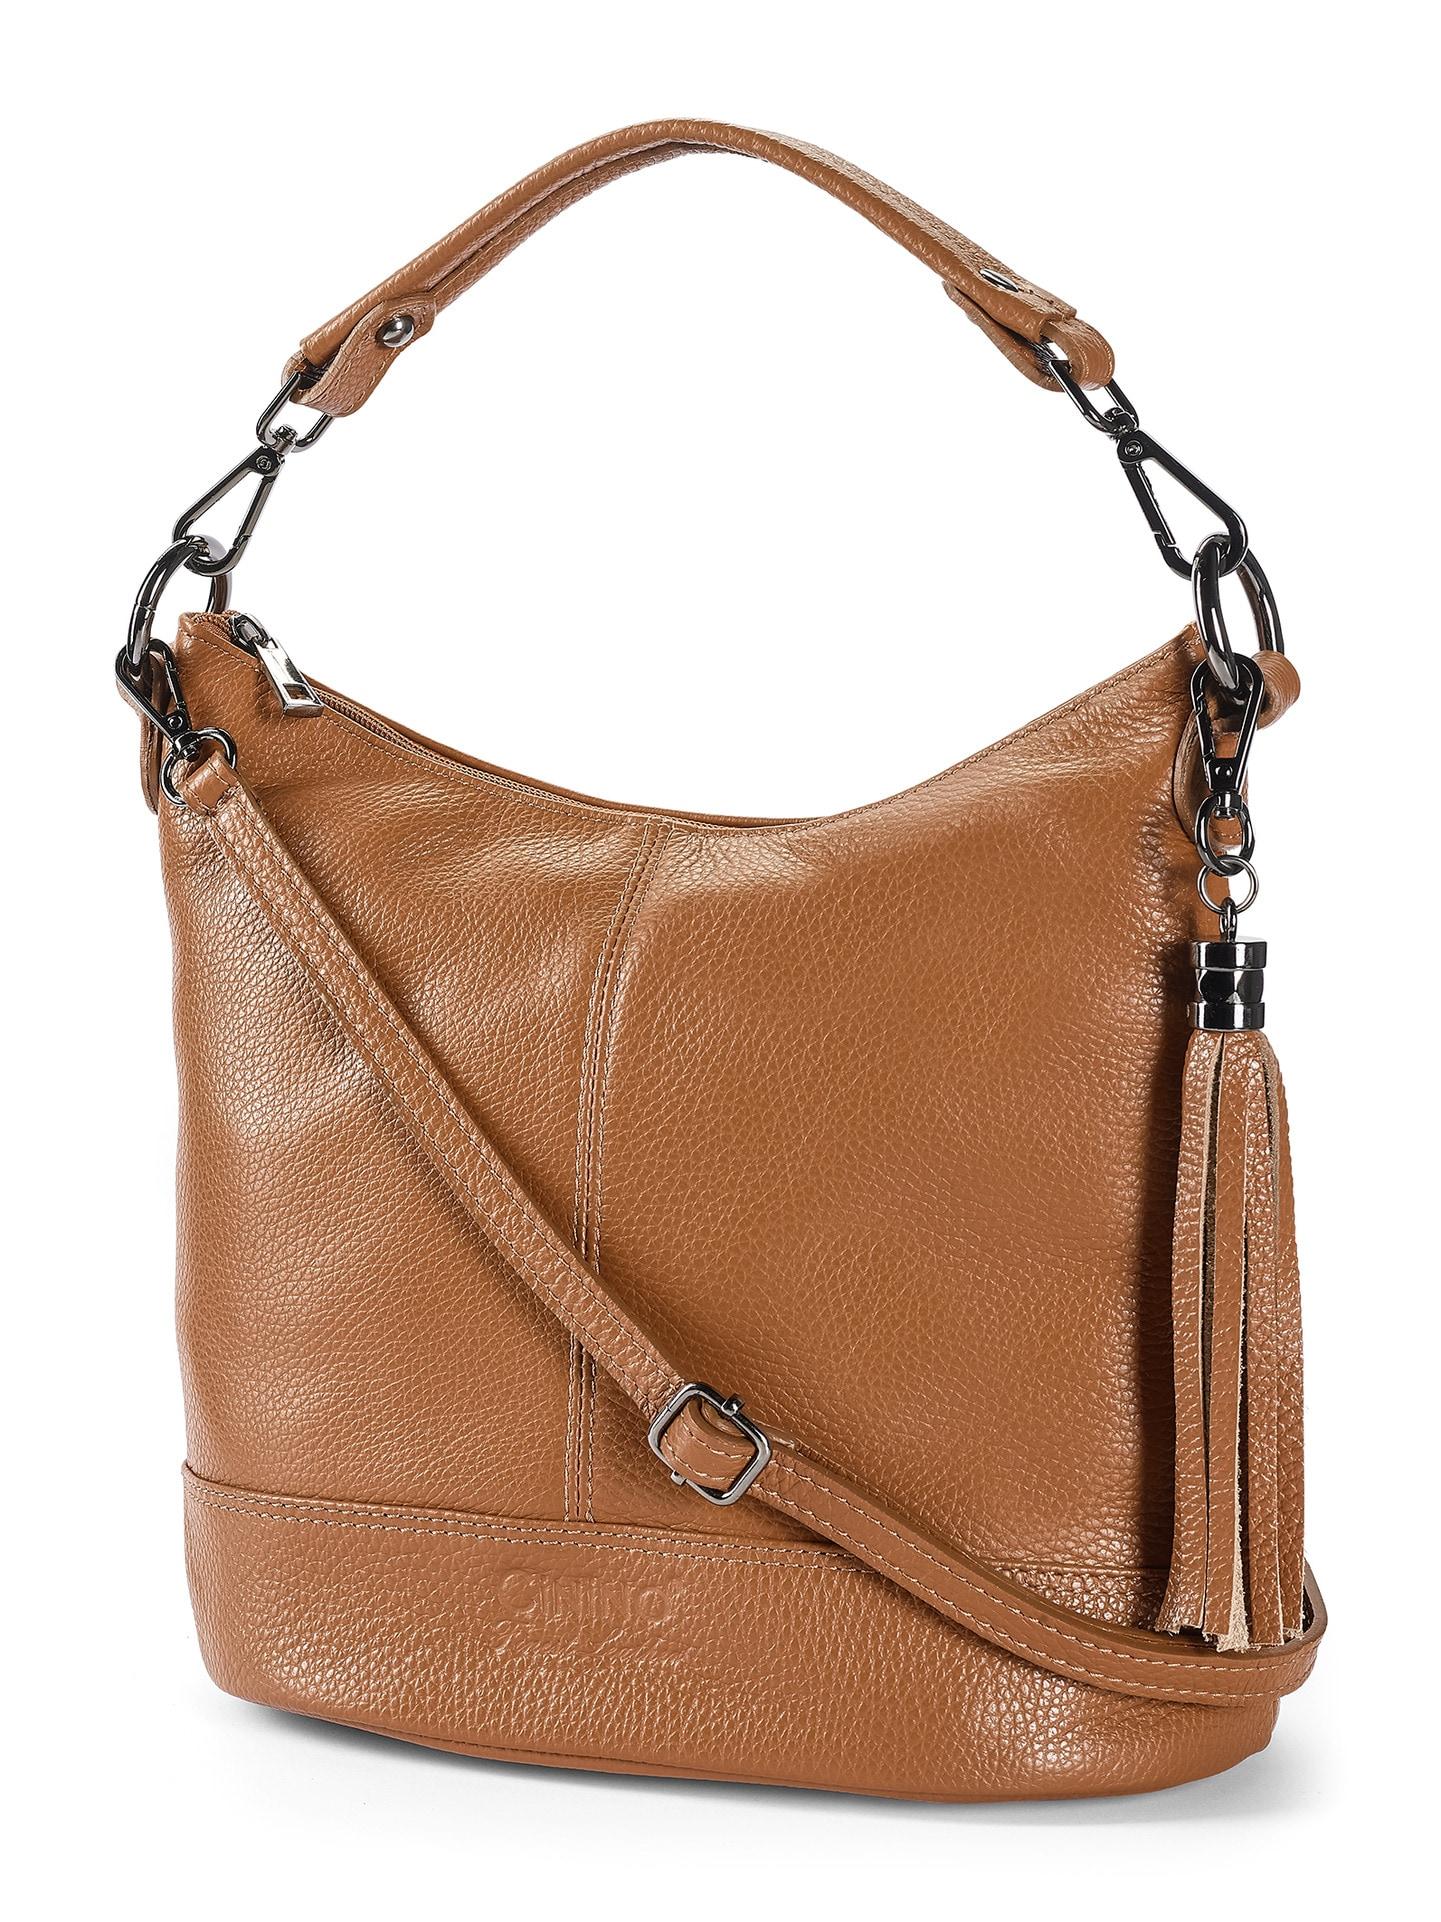 Walbusch Damen Lederhandtasche Standfest einfarbig Cognac 01 49-0051-1